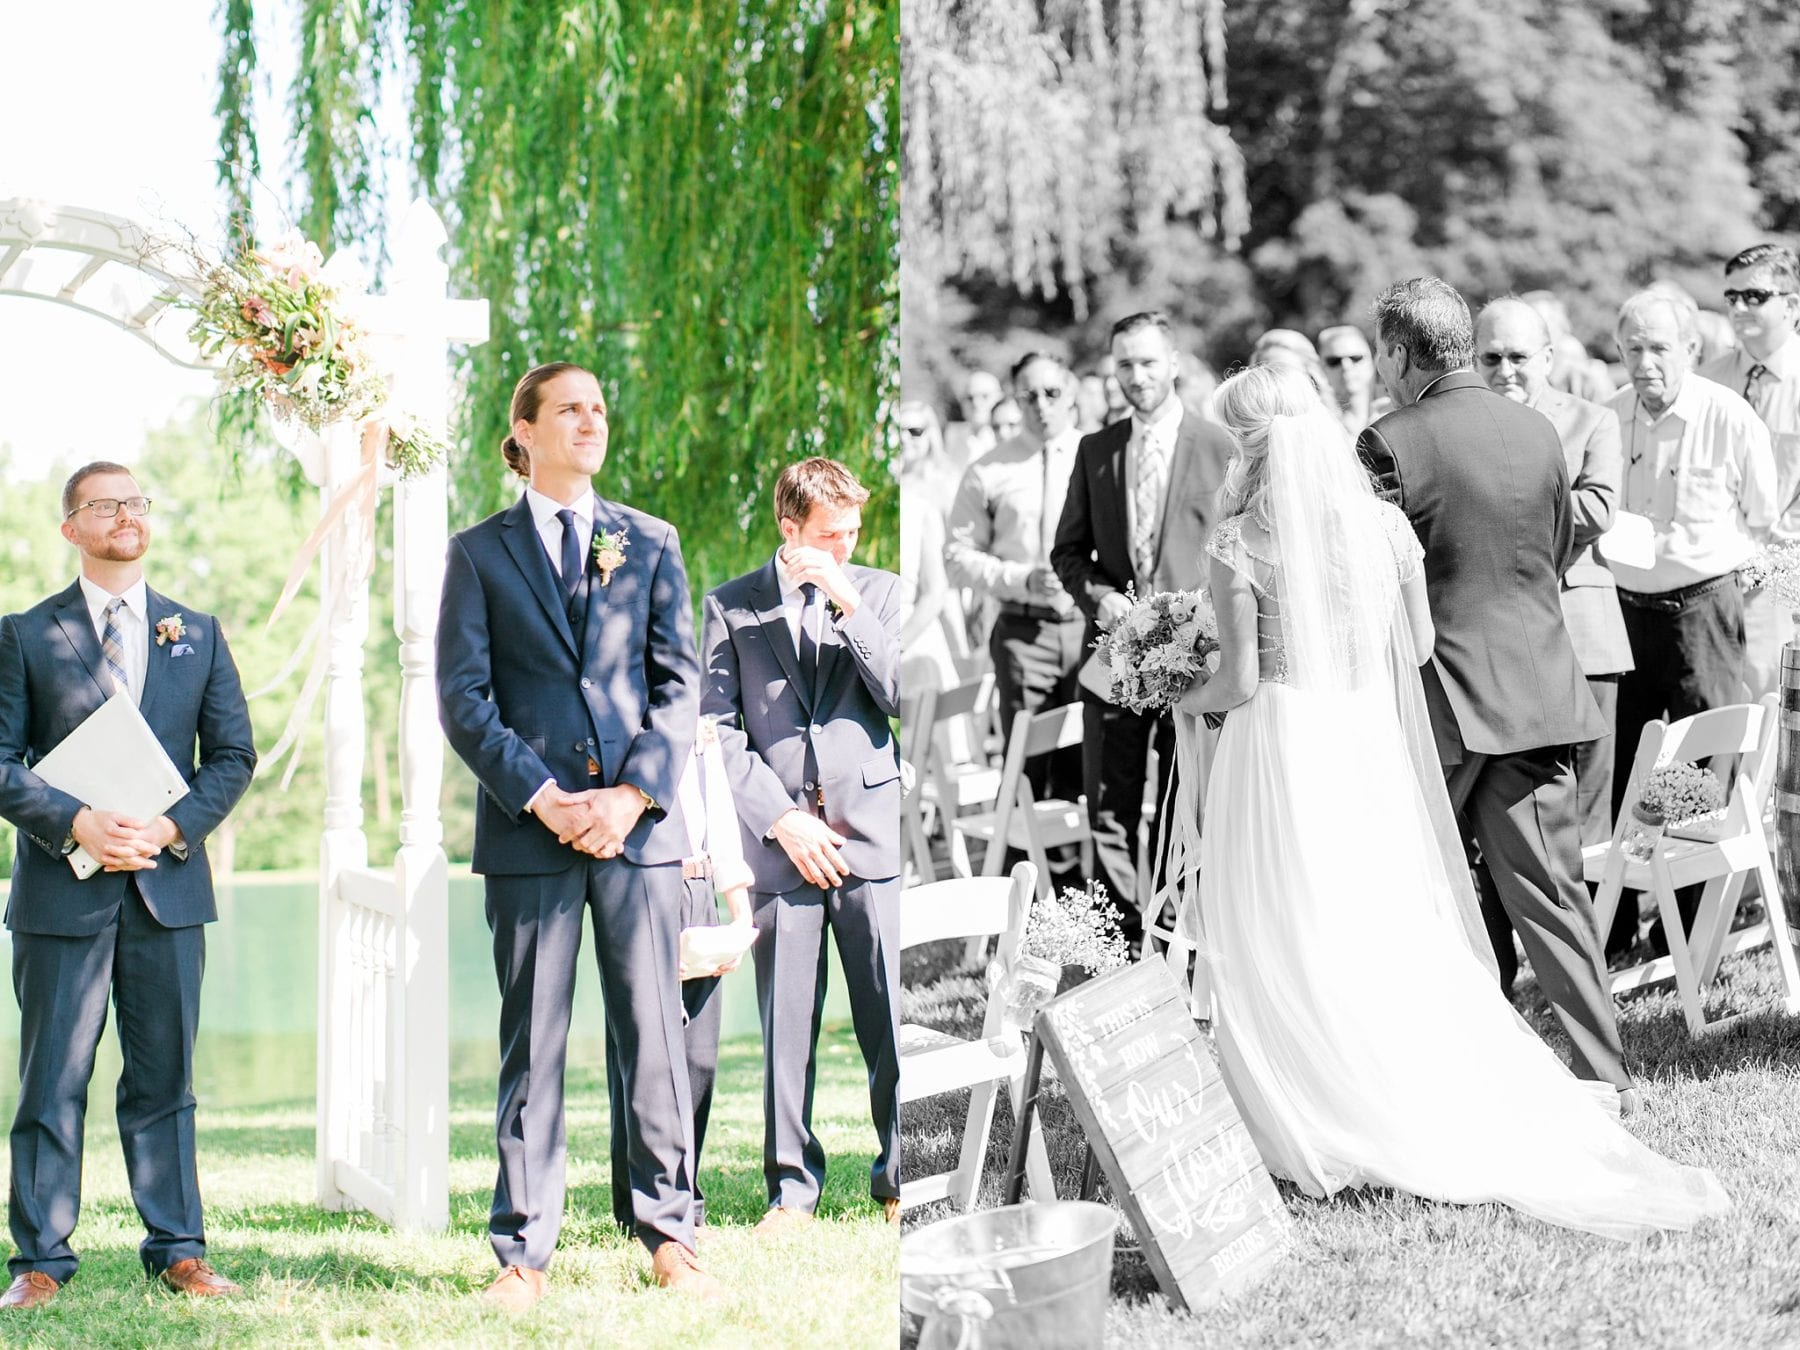 Pond View Farm Wedding Photos Maryland Wedding Photographer Kristen & Ryan Megan Kelsey Photography Blog-114.jpg